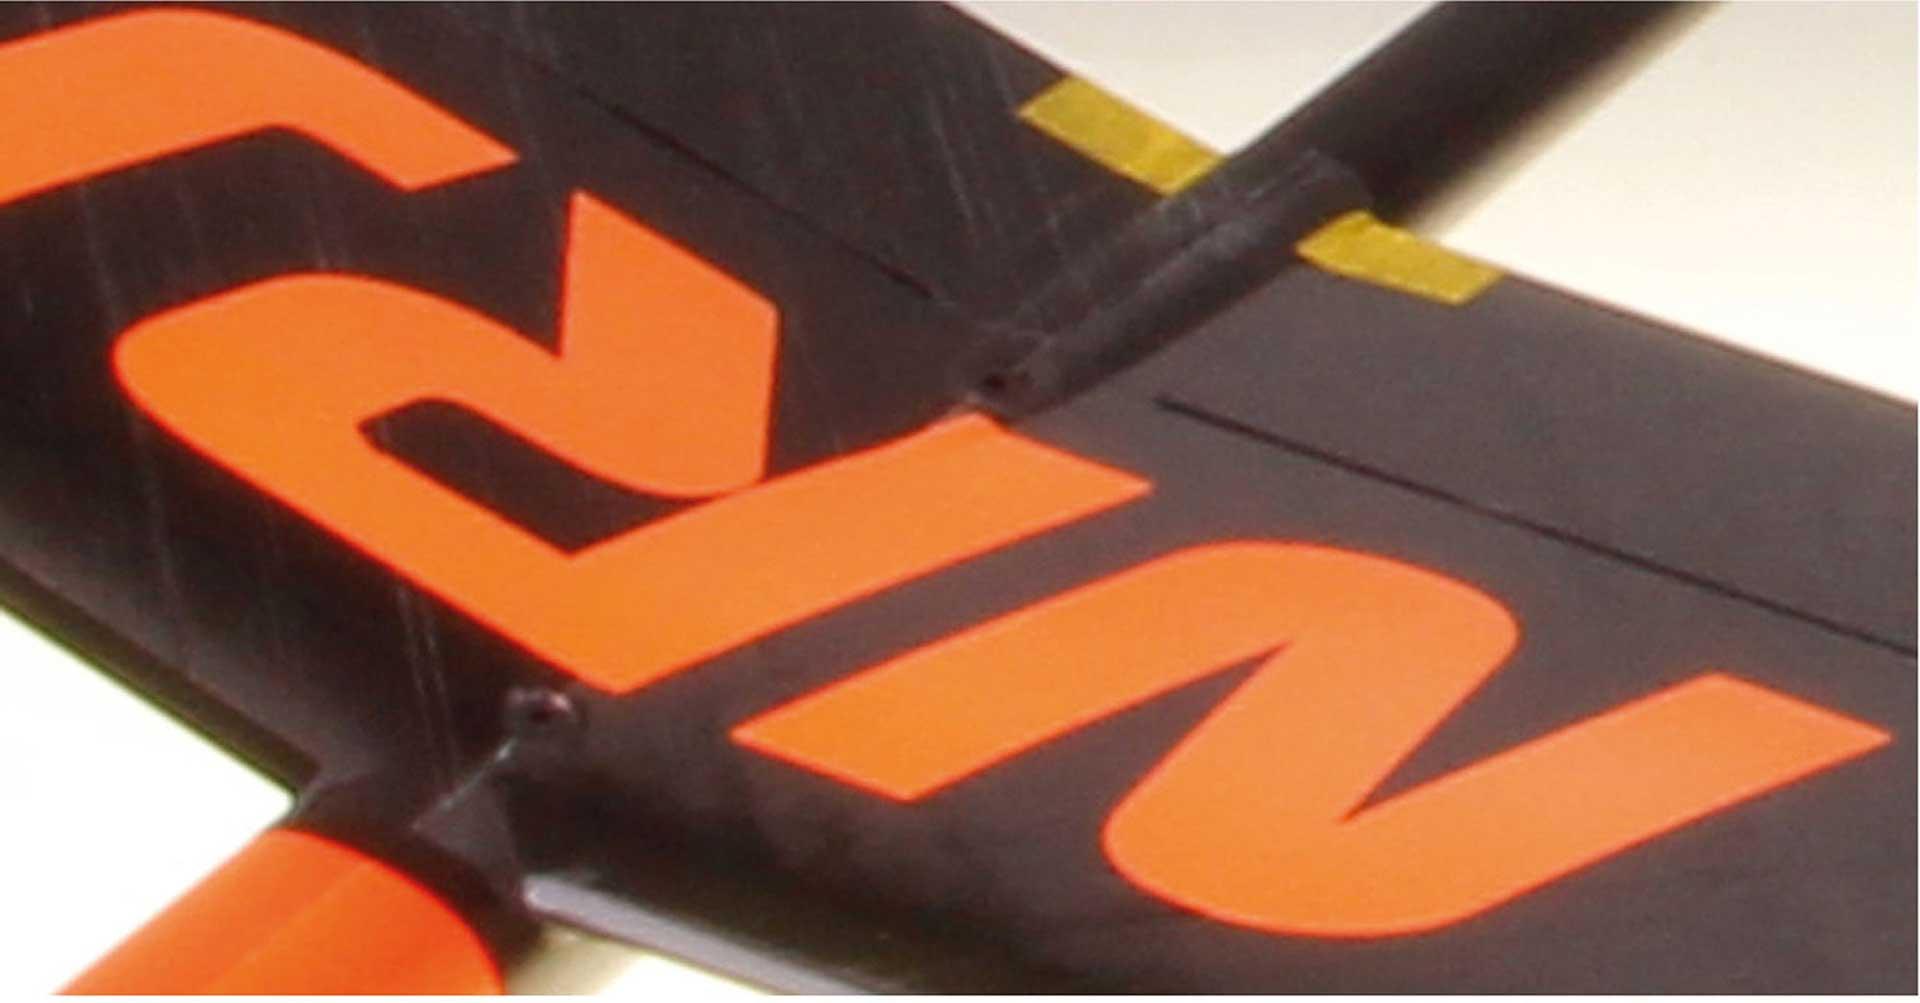 OA-COMPOSITES NRJ F3K ORANGE # 18 CW40 + 4PCS. KST X08 SERVOS